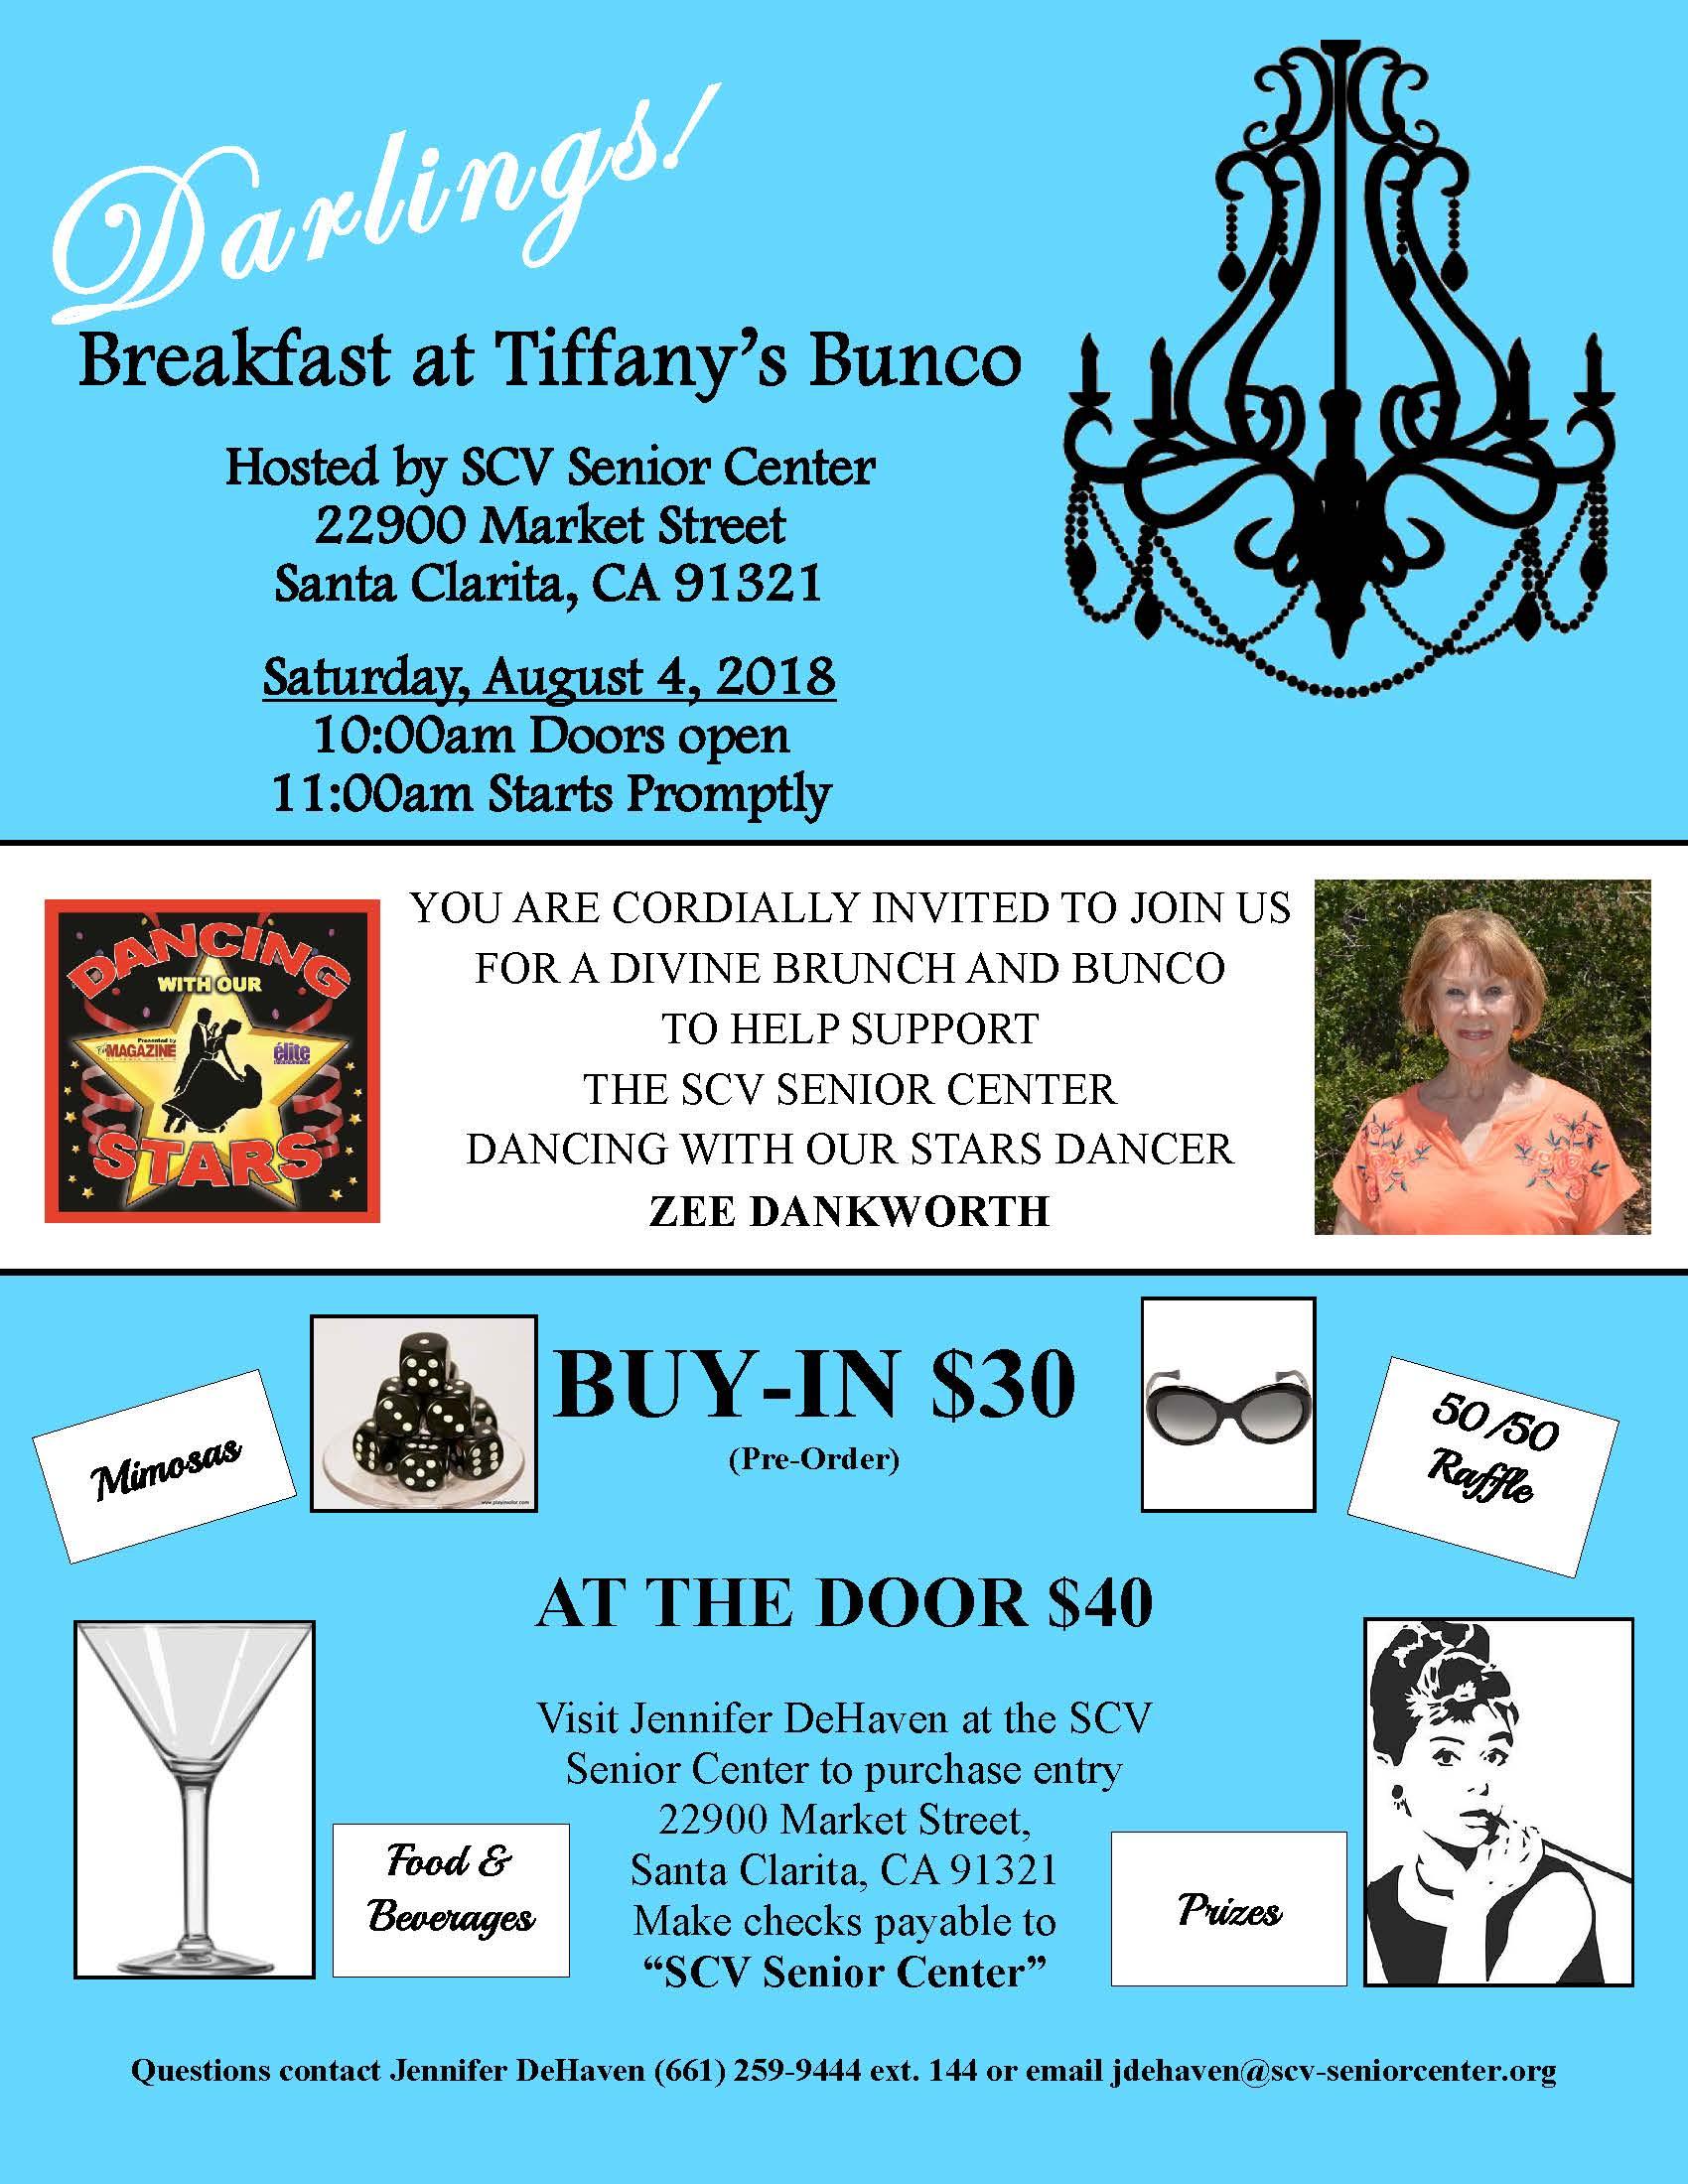 Breakfast at Tiffany's Bunco 8-4